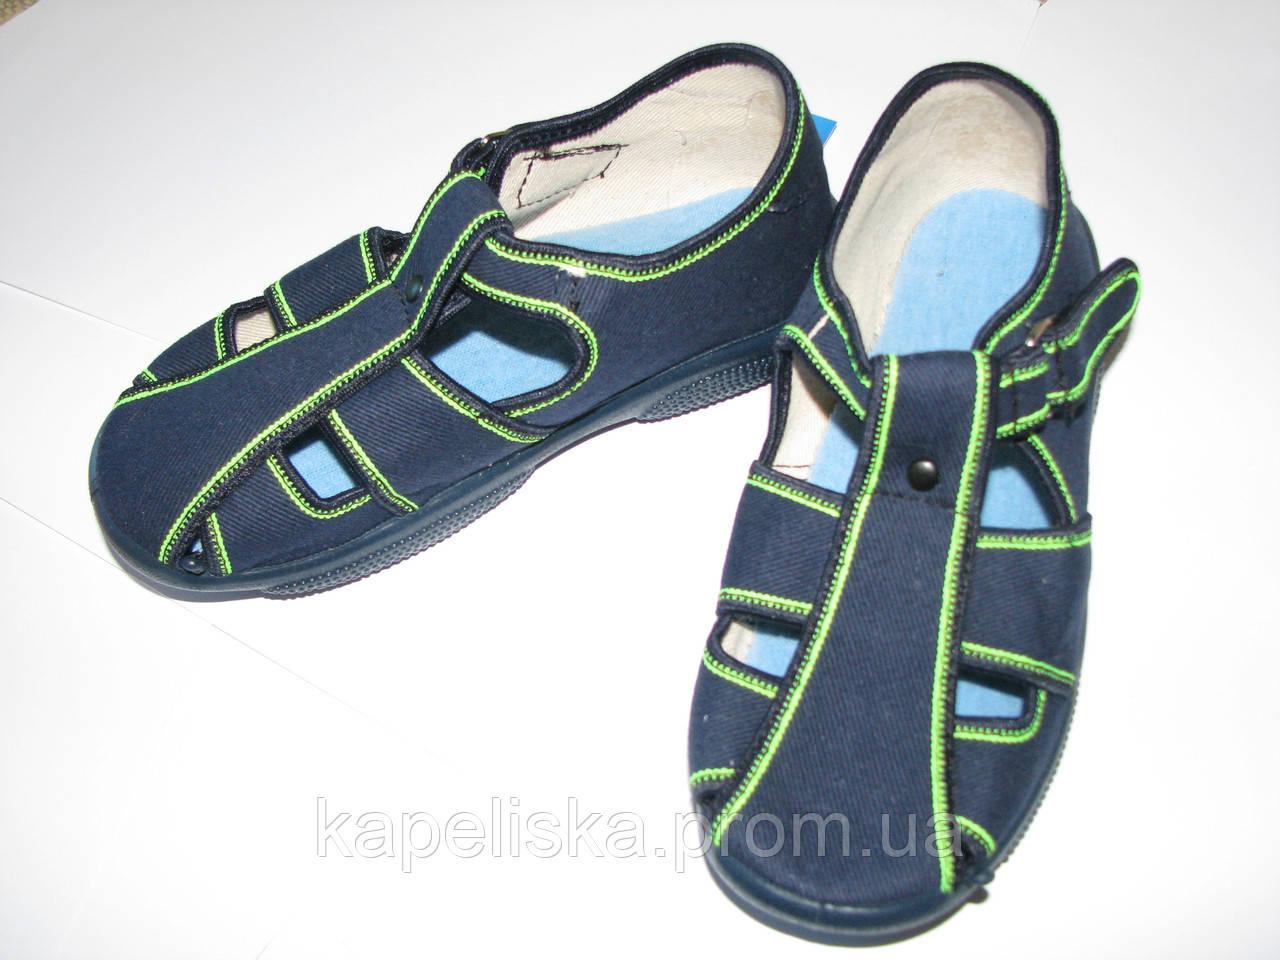 ff5d2e082466d4 Zetpol Bolek Зетпол болек тапочки, макасины, босоножки, сандали , для  мальчика, босоніжки